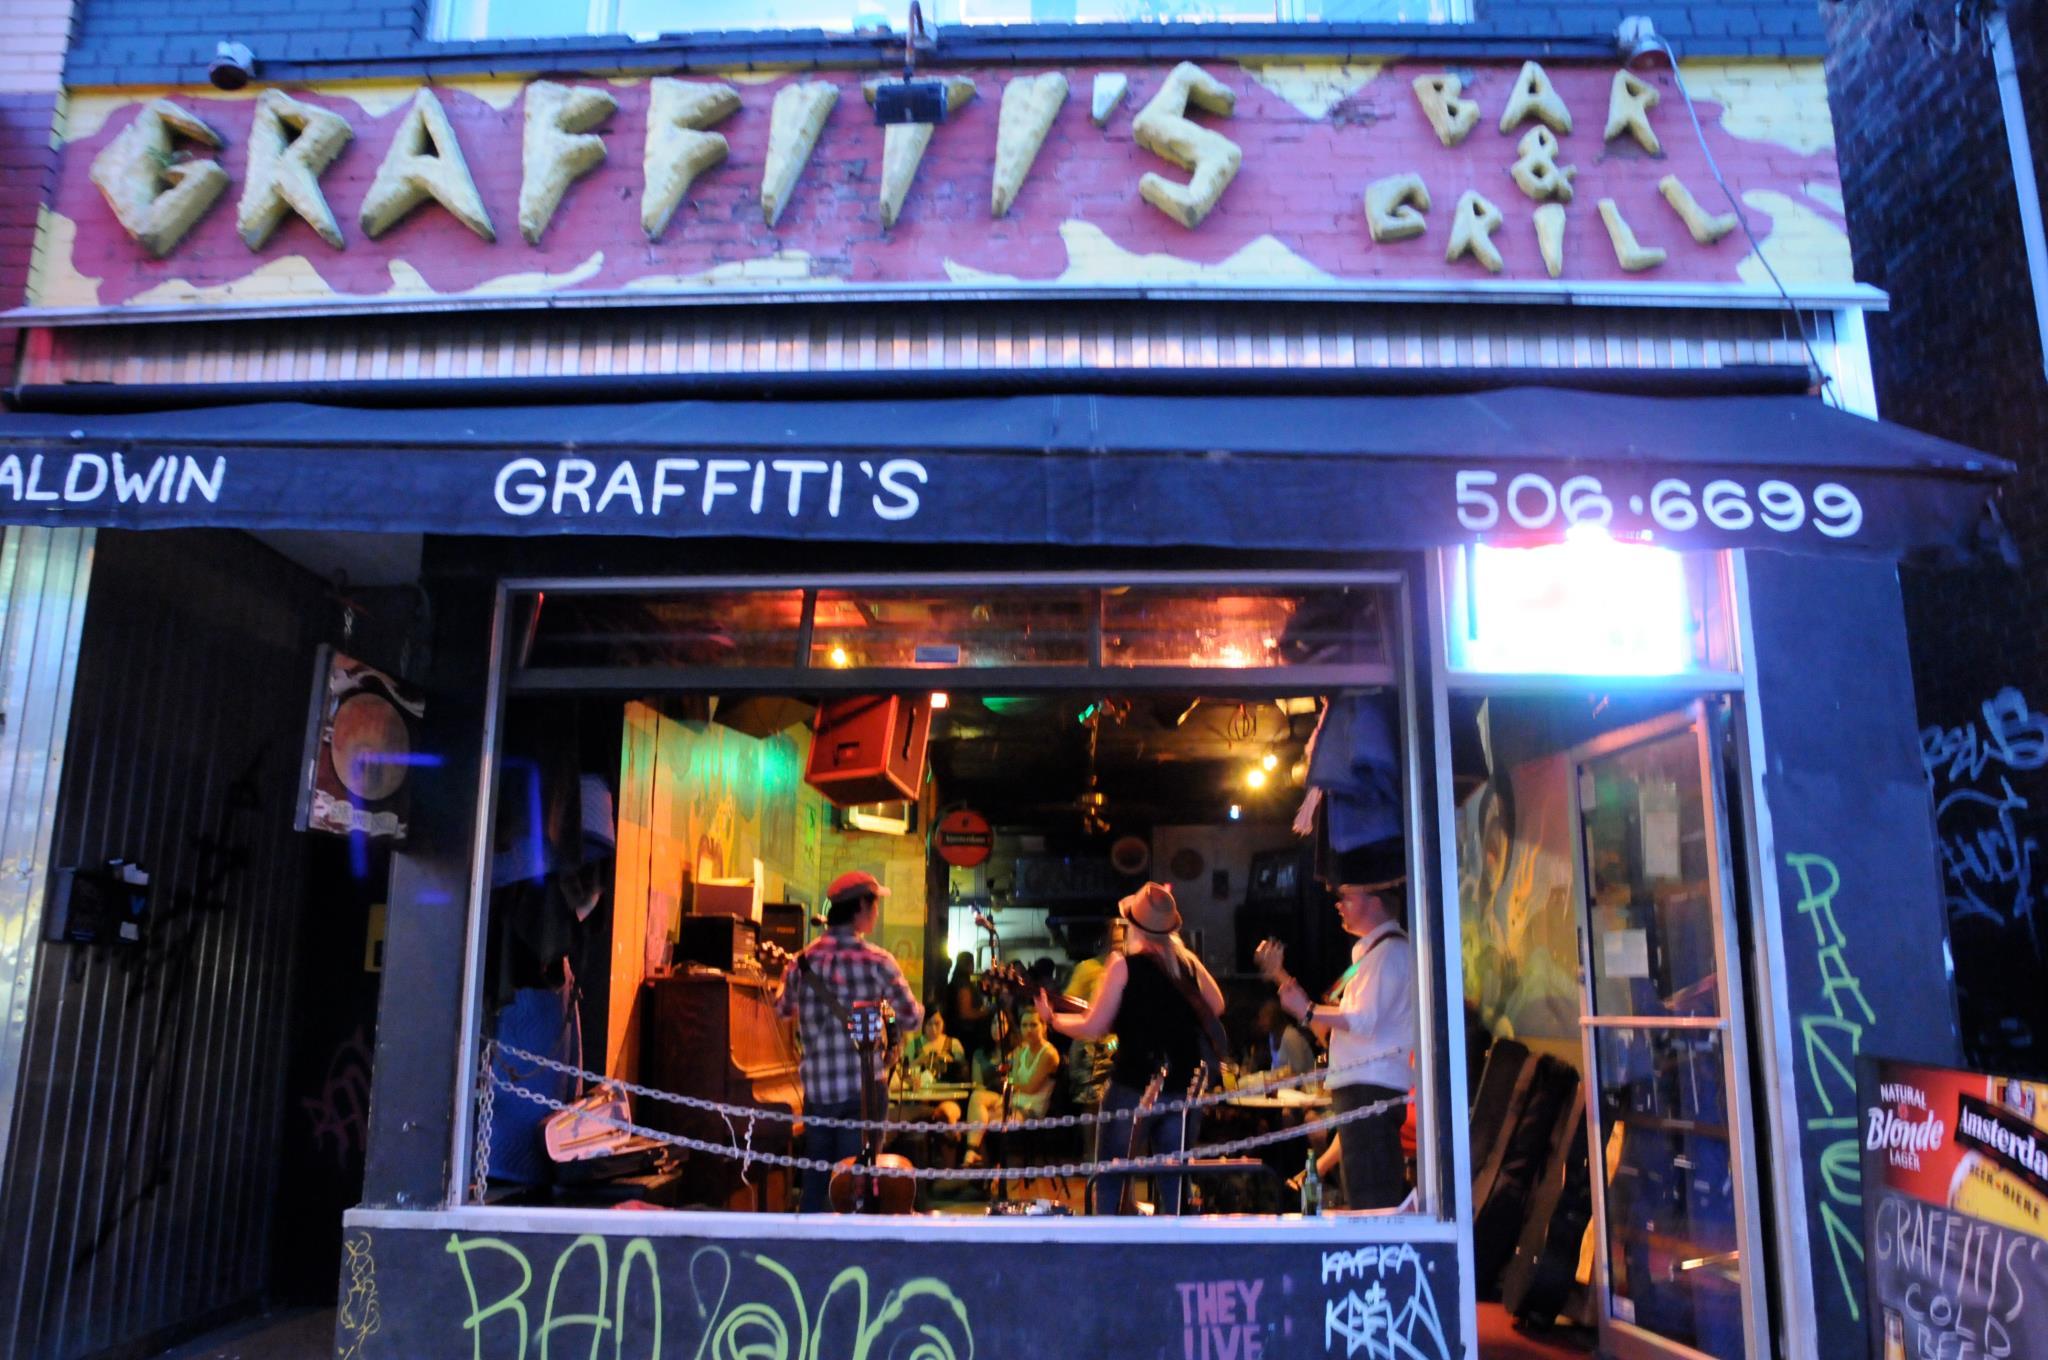 Graffiti's Bar and Grill